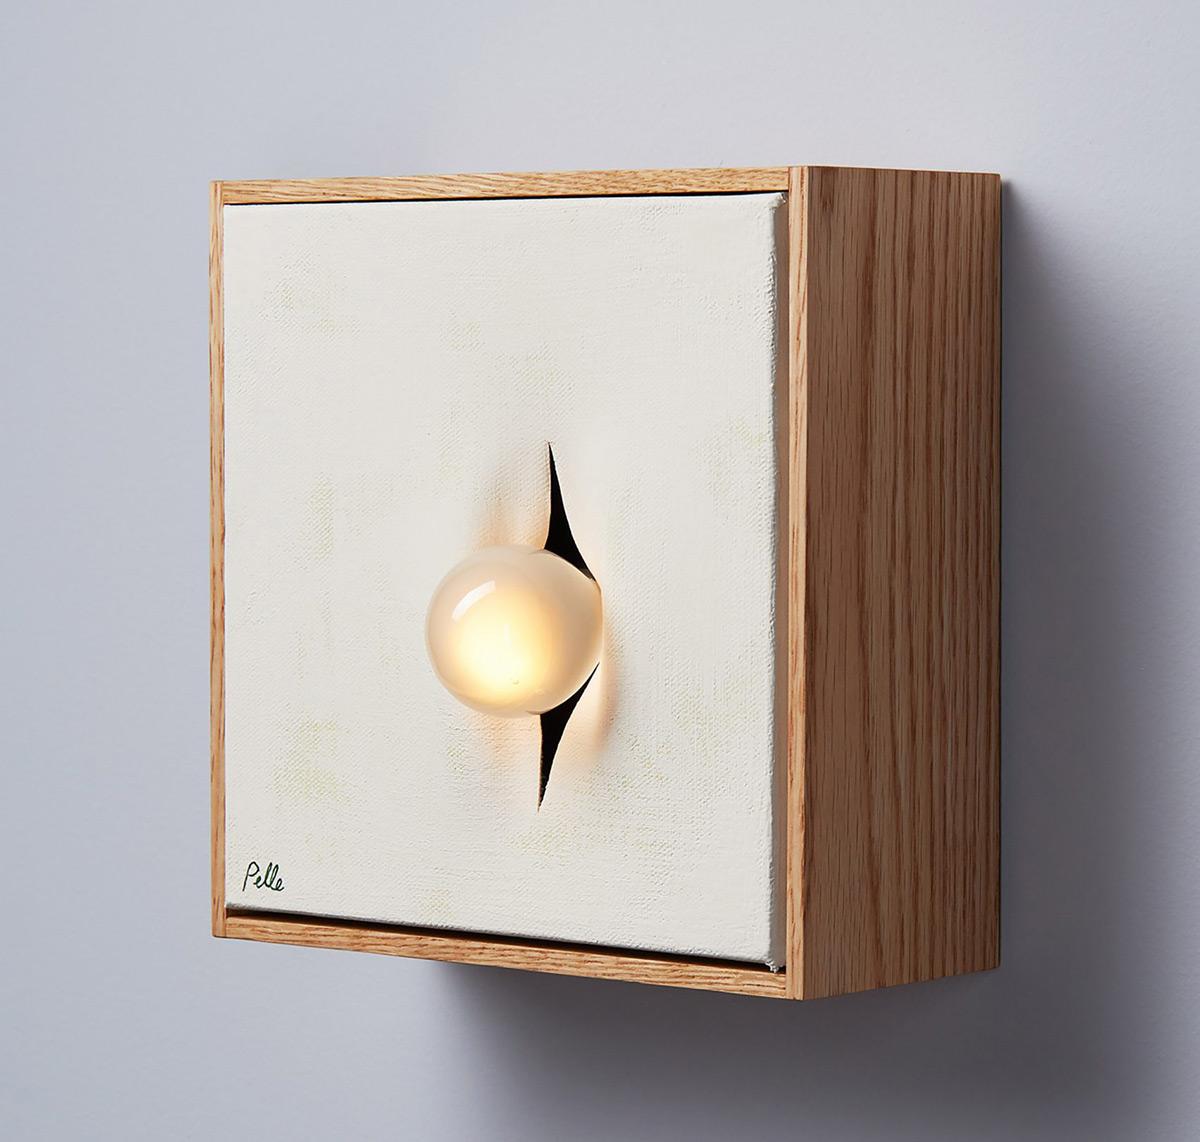 Incise-Paintings-Pelle-Design-Daniel-Seung-Lee-03